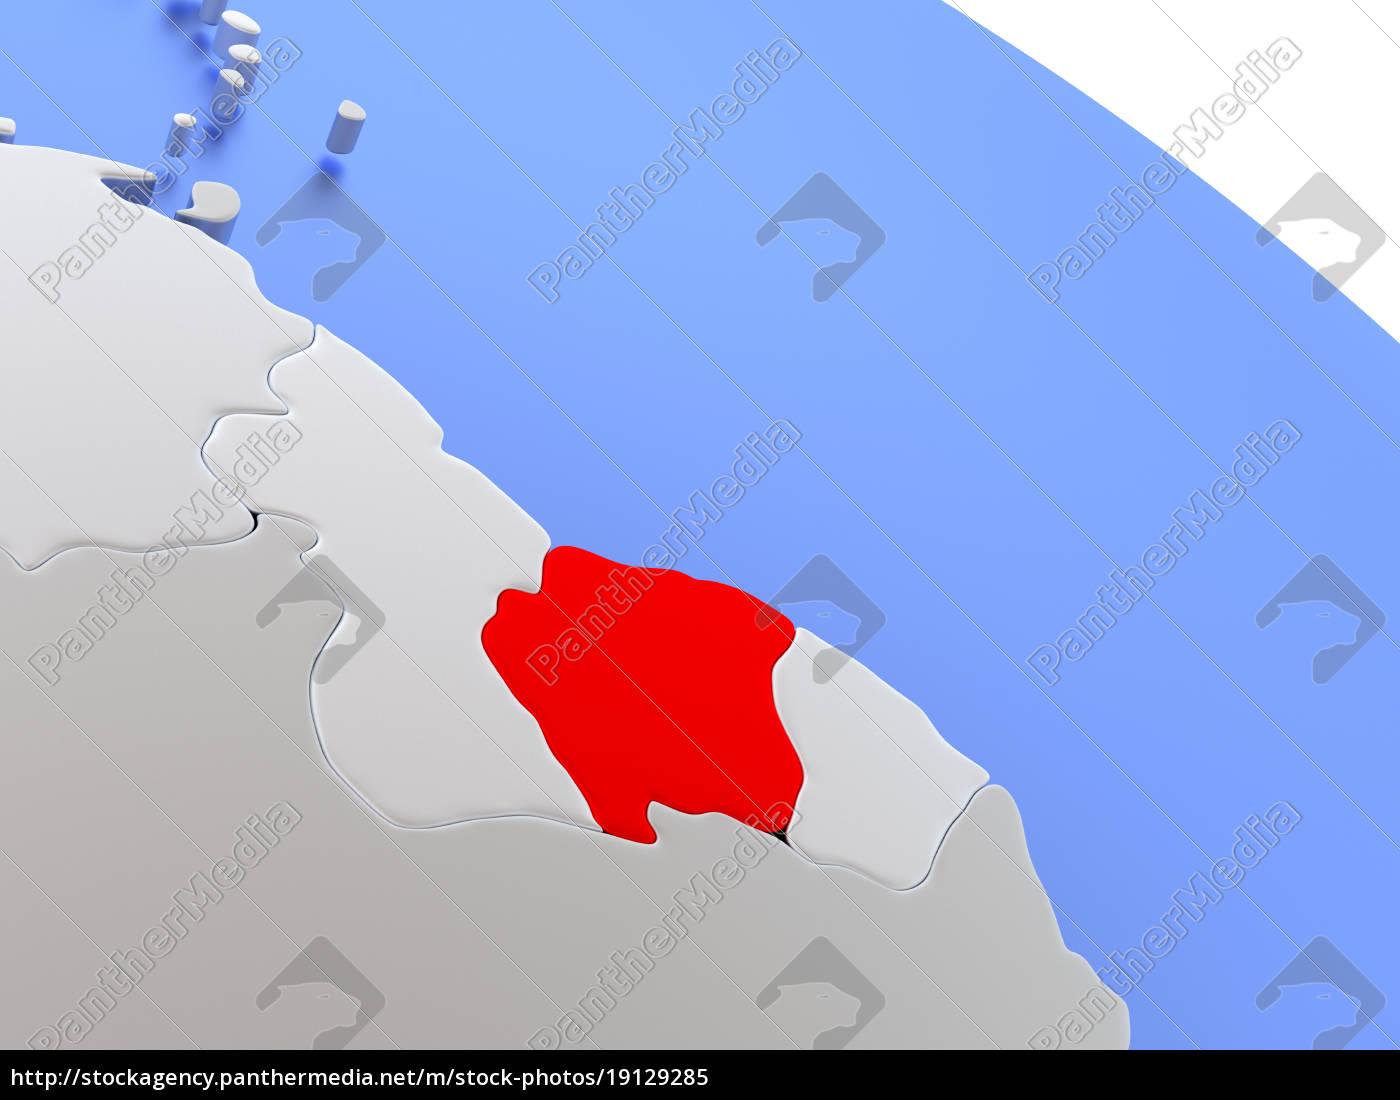 suriname, on, world, map - 19129285